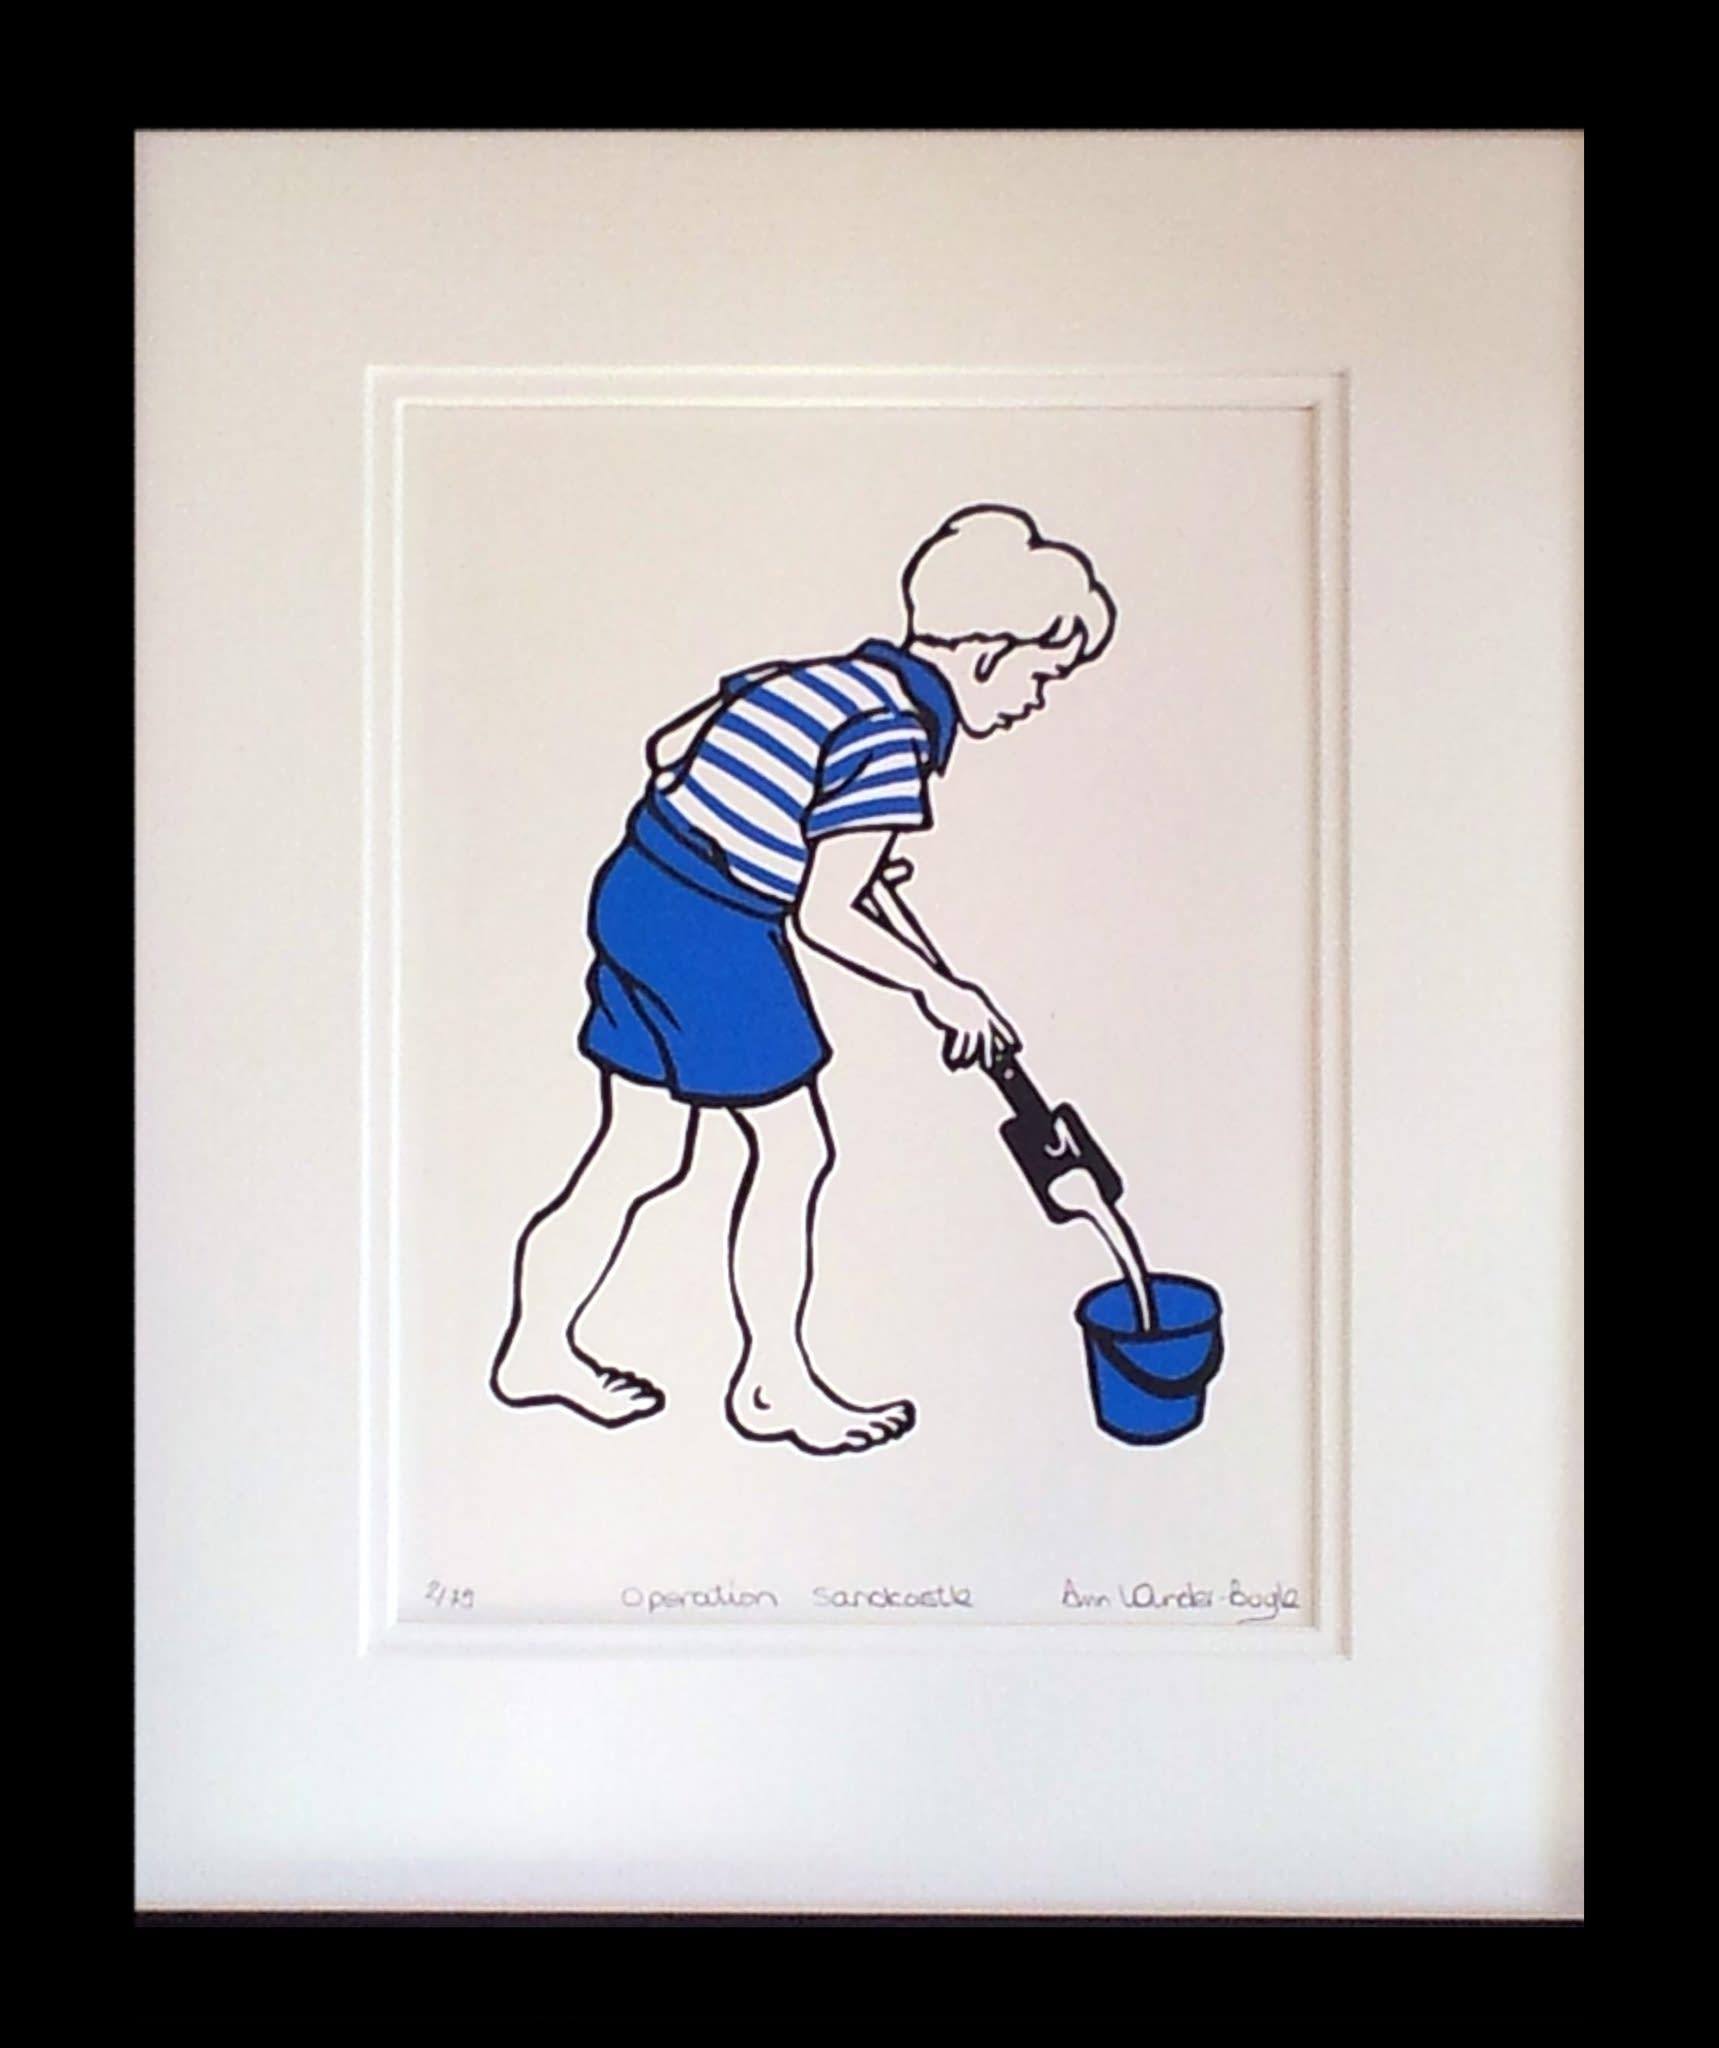 "<span class=""link fancybox-details-link""><a href=""/artists/37-ann-winder-boyle/works/96-ann-winder-boyle-operation-sandcastle-2014/"">View Detail Page</a></span><div class=""artist""><strong>Ann Winder-Boyle</strong></div> b. 1963 <div class=""title""><em>Operation Sandcastle</em>, 2014</div> <div class=""signed_and_dated"">signed, titled and numbered in pencil</div> <div class=""medium"">linocut on paper</div> <div class=""dimensions"">20 x 15 cm</div> <div class=""edition_details"">edition of 75</div><div class=""price"">£125.00</div>"